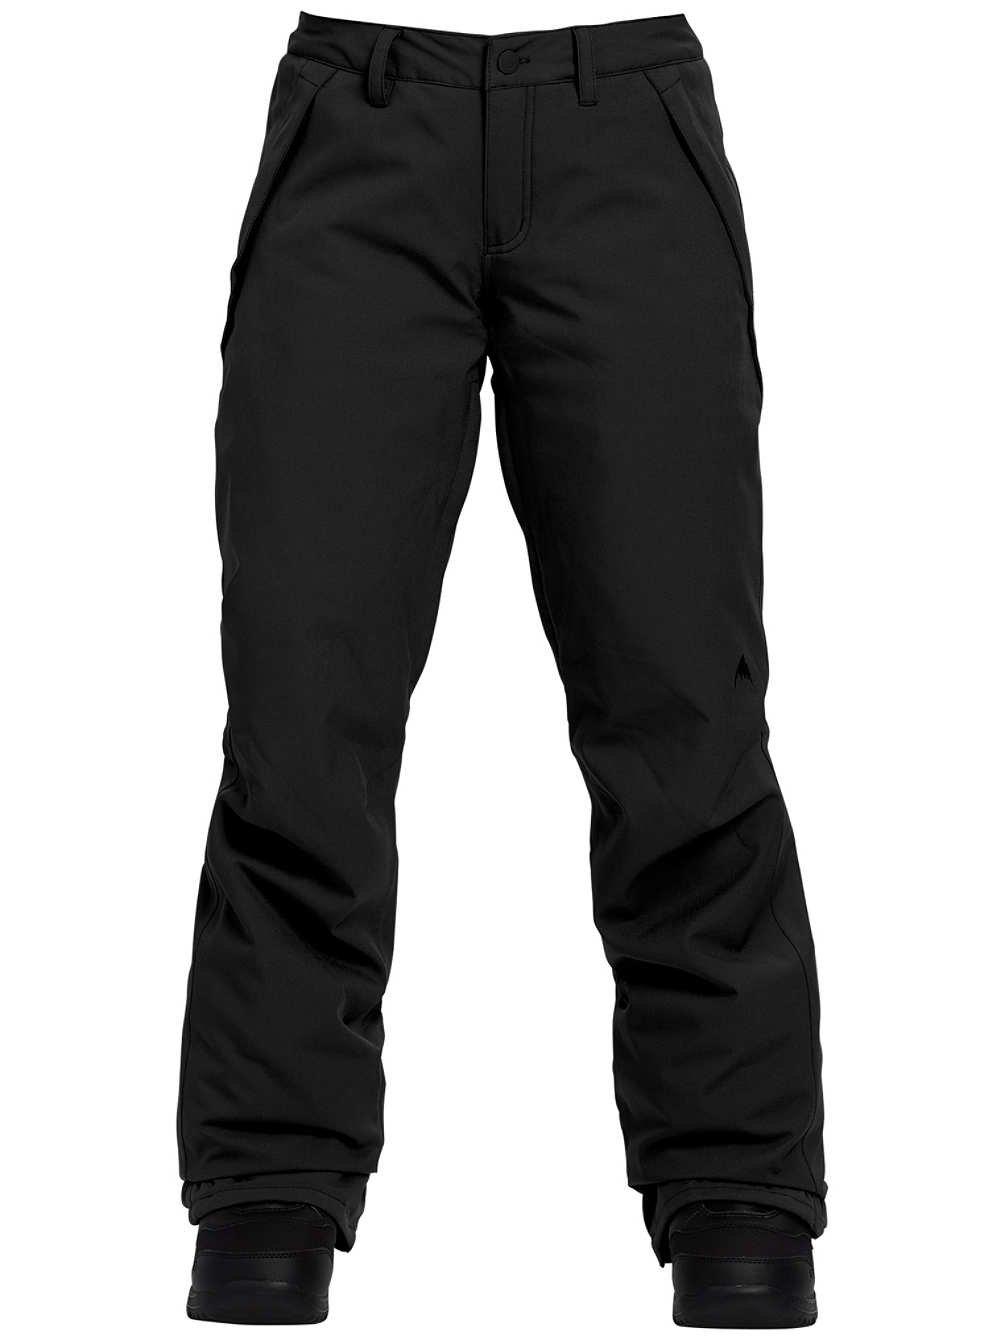 Noir XXS Burton Society Pantalon de Snowboard Femme